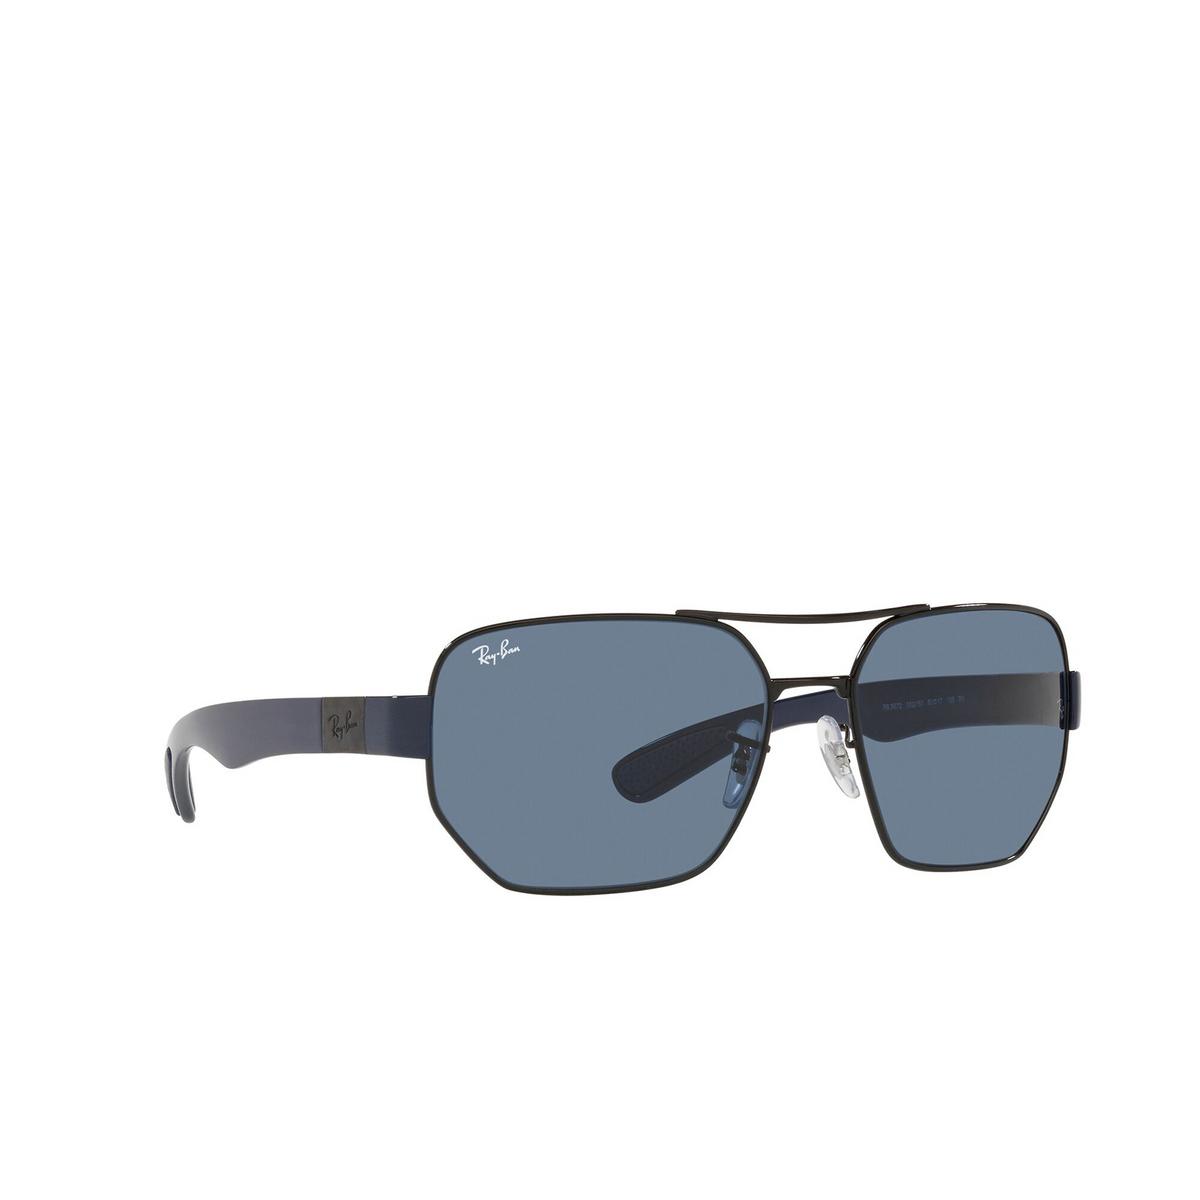 Ray-Ban® Irregular Sunglasses: RB3672 color Black 002/80 - three-quarters view.